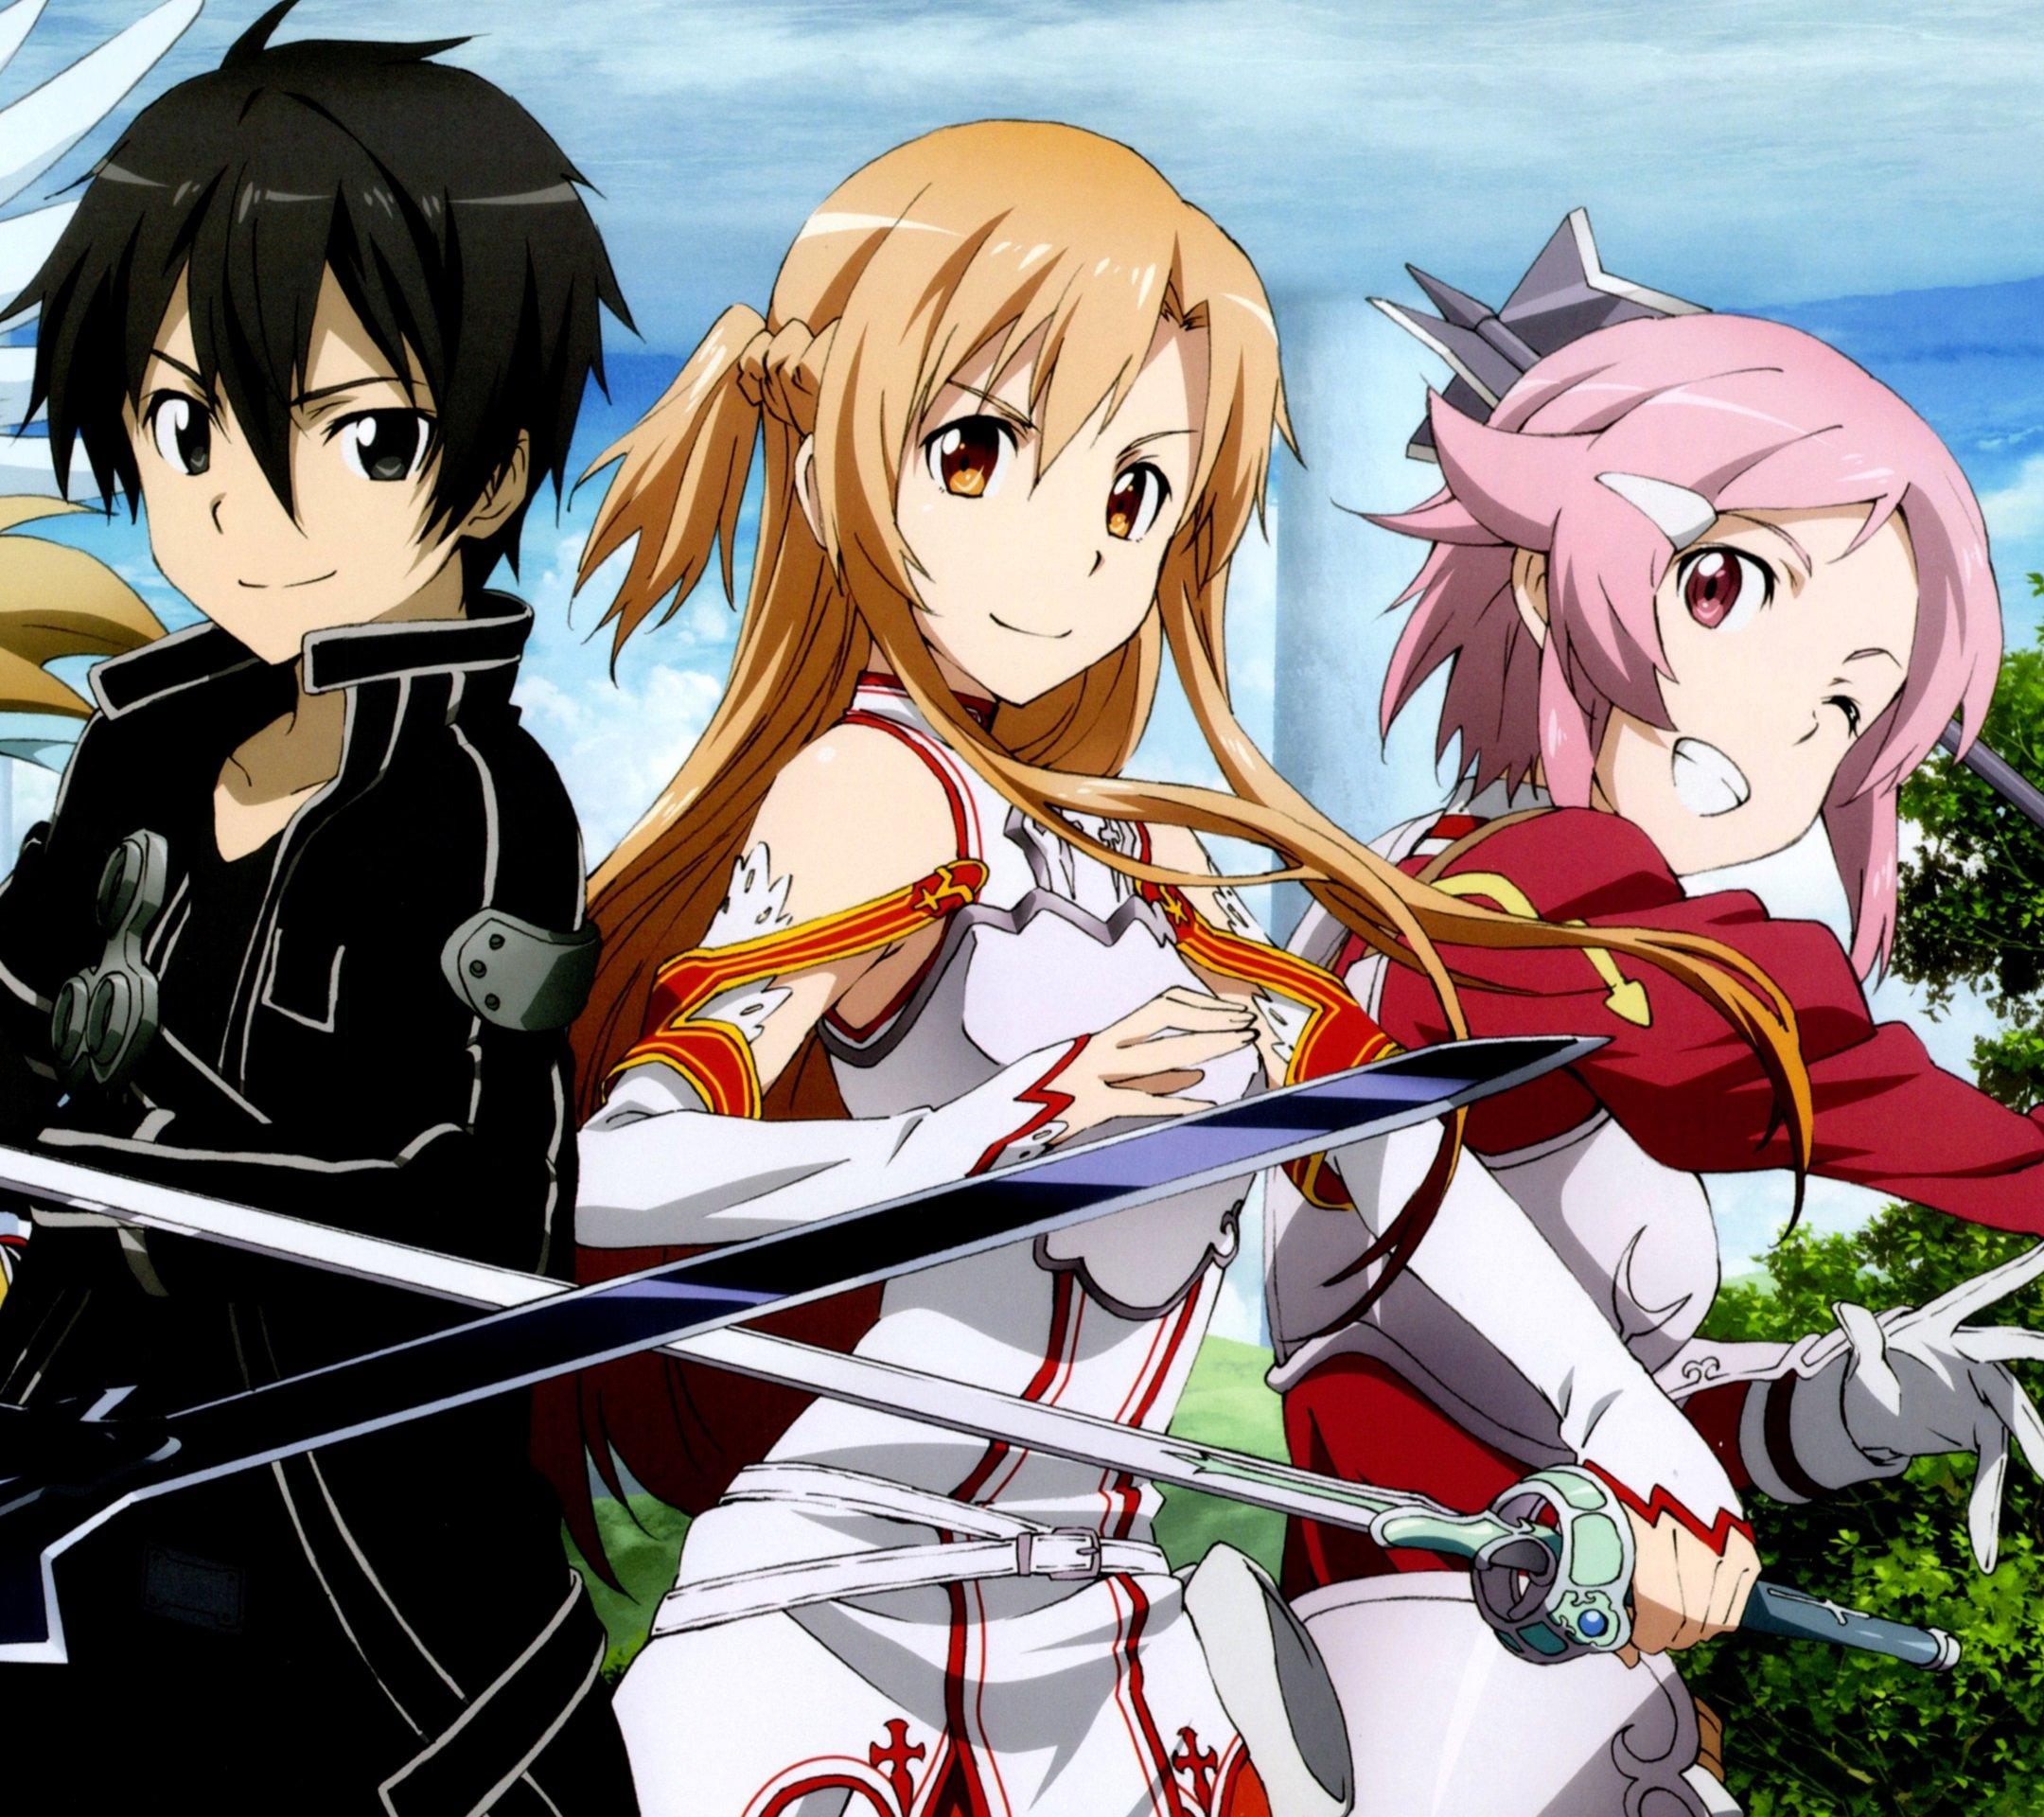 sword art online lisbeth and kirito wwwimgkidcom the